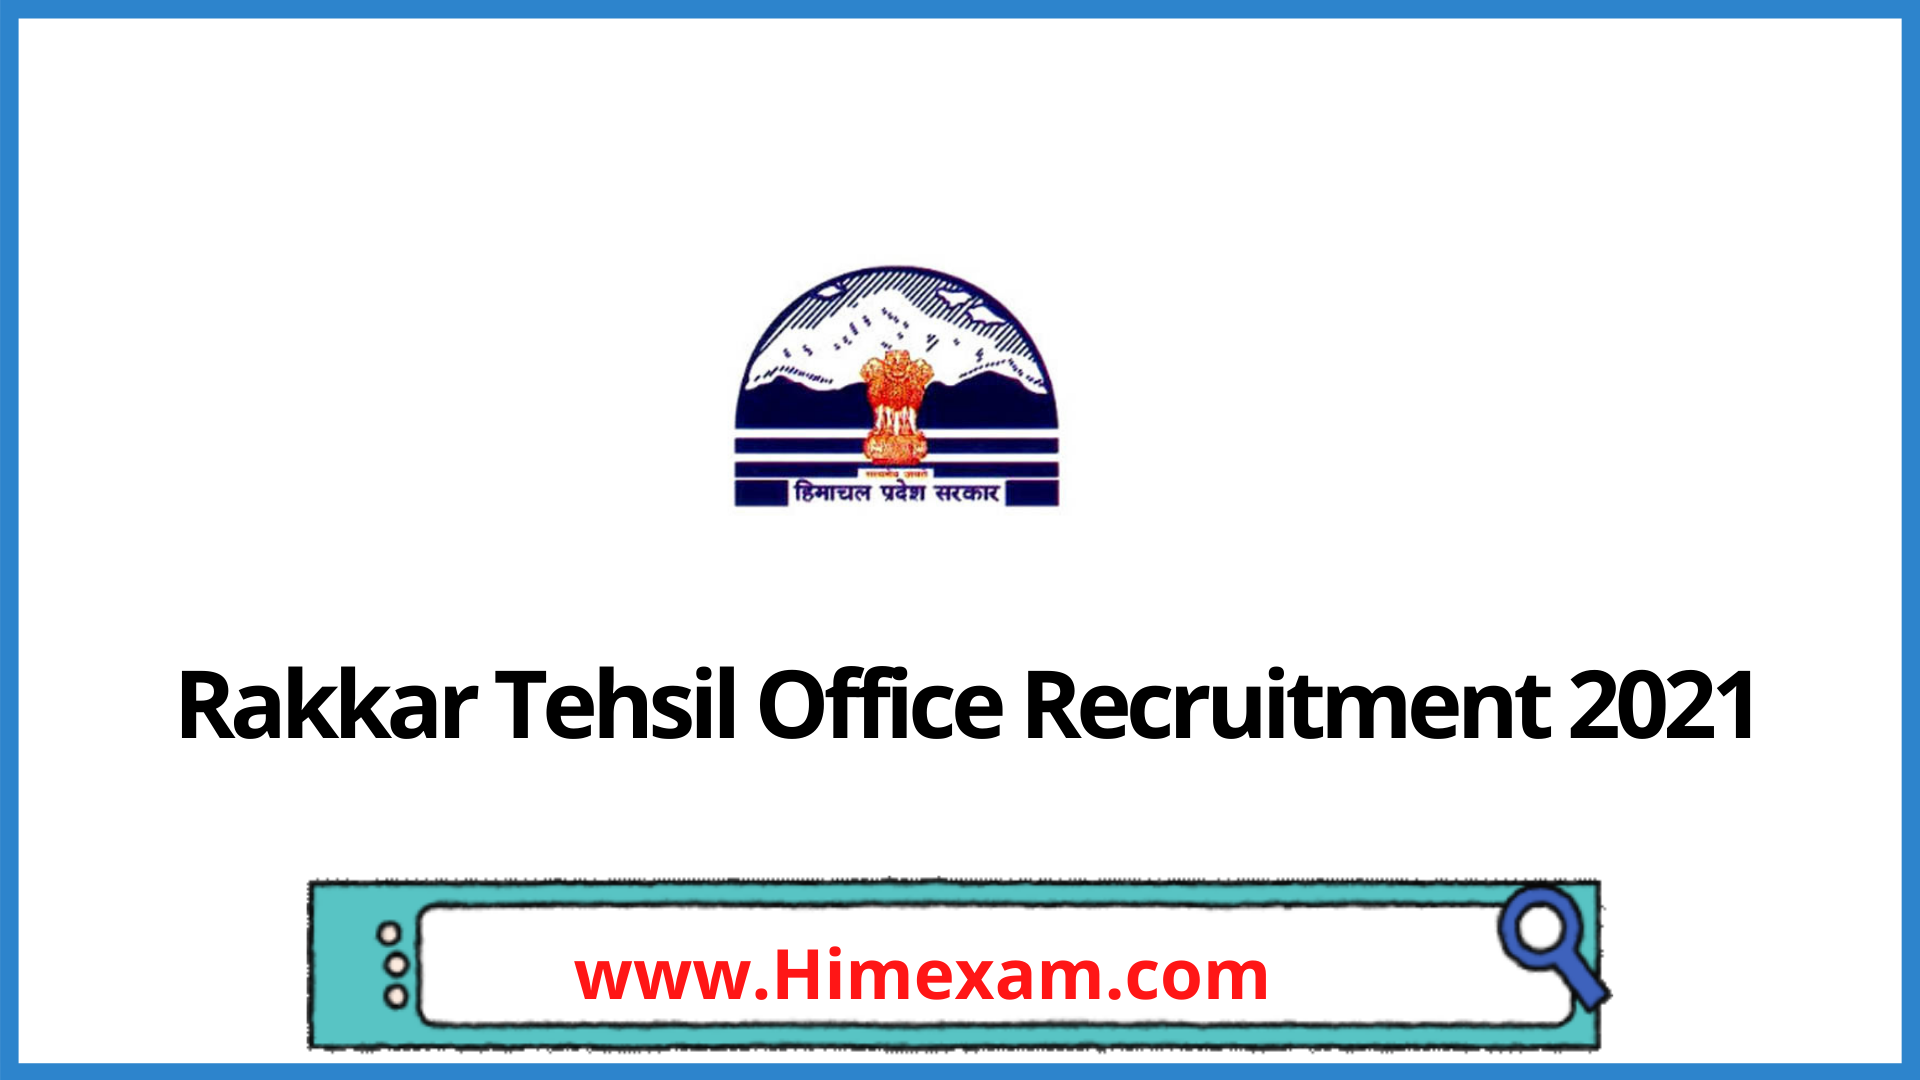 Rakkar Tehsil Office Recruitment 2021